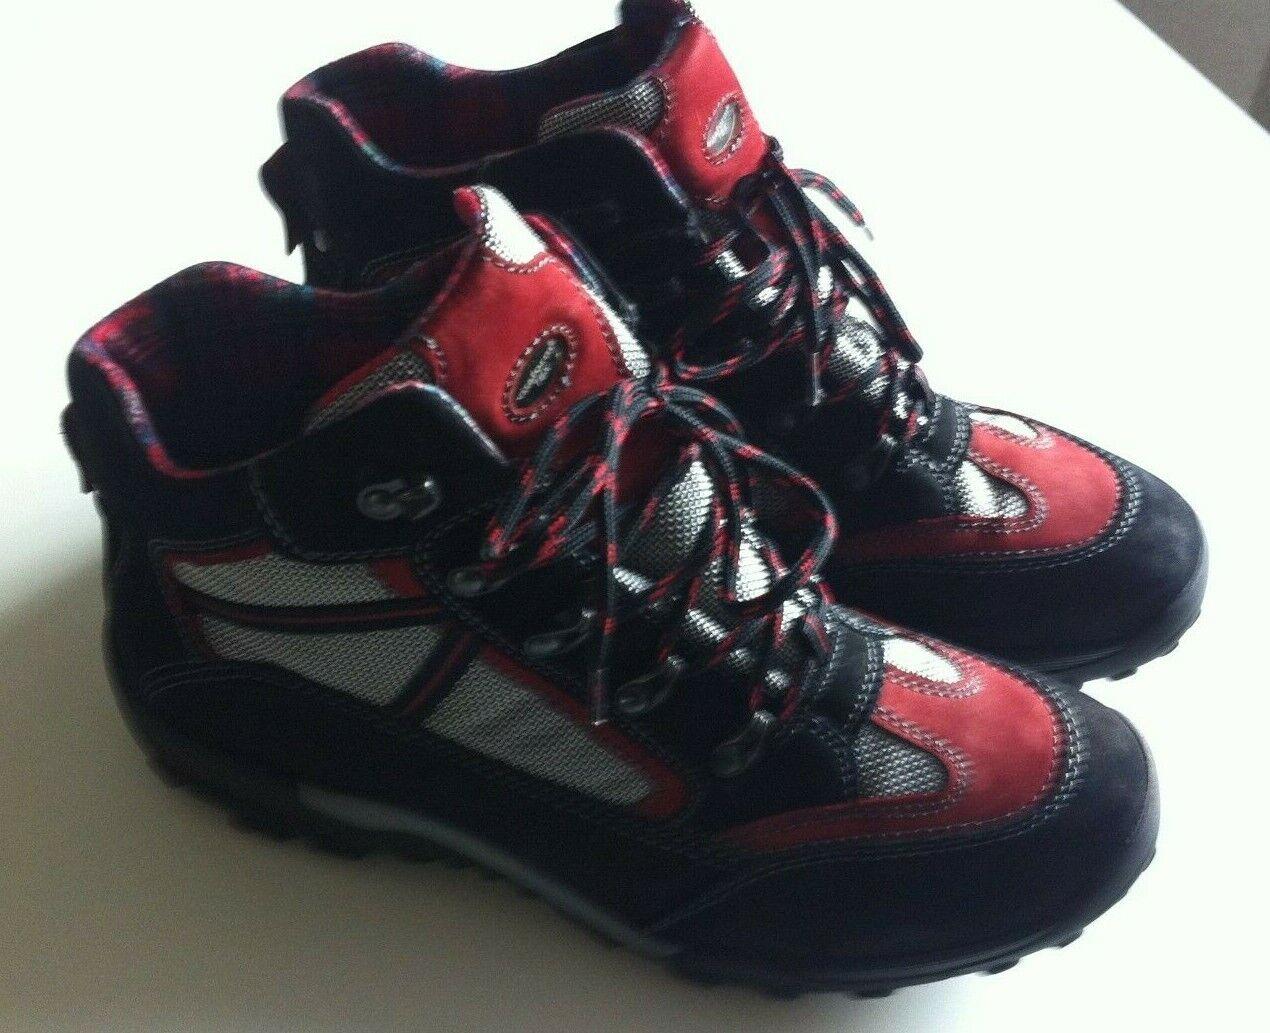 VITAFORM ACTIVE Trekking-Stiefel Nubuk Textil Profilsohle Schwarz Rot 38H